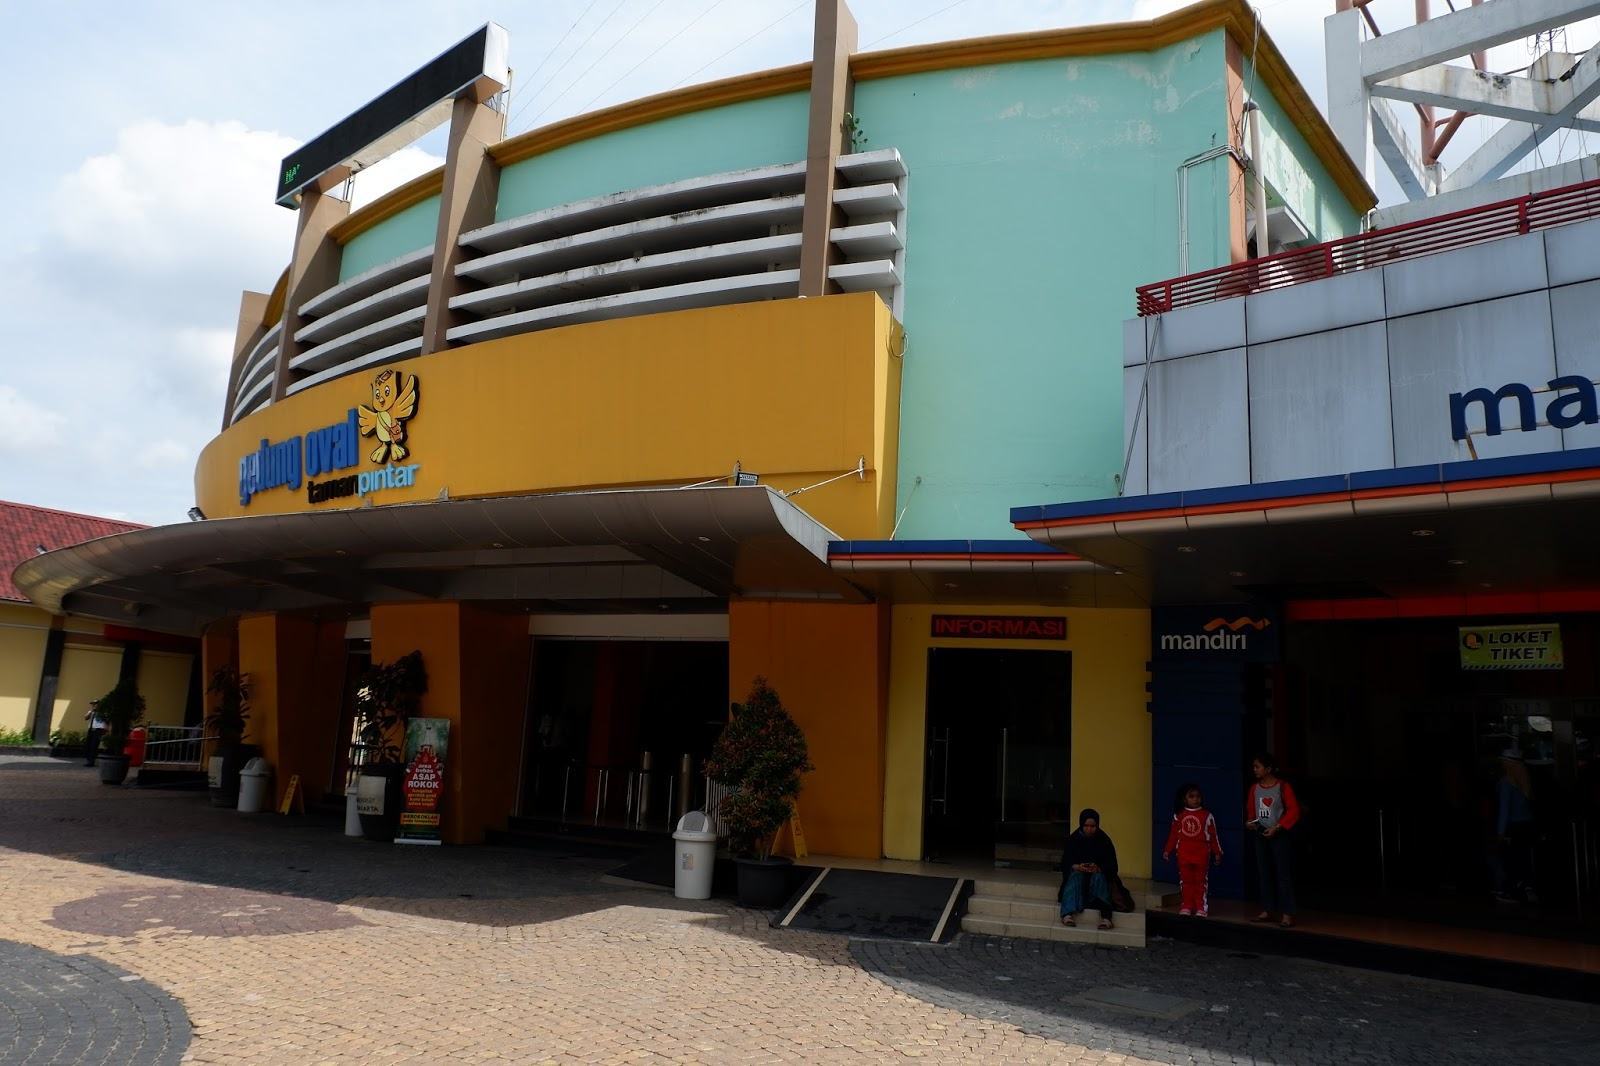 Belajar Sains Taman Pintar Yogyakarta Rach Alida Bahaweres Gedung Oval